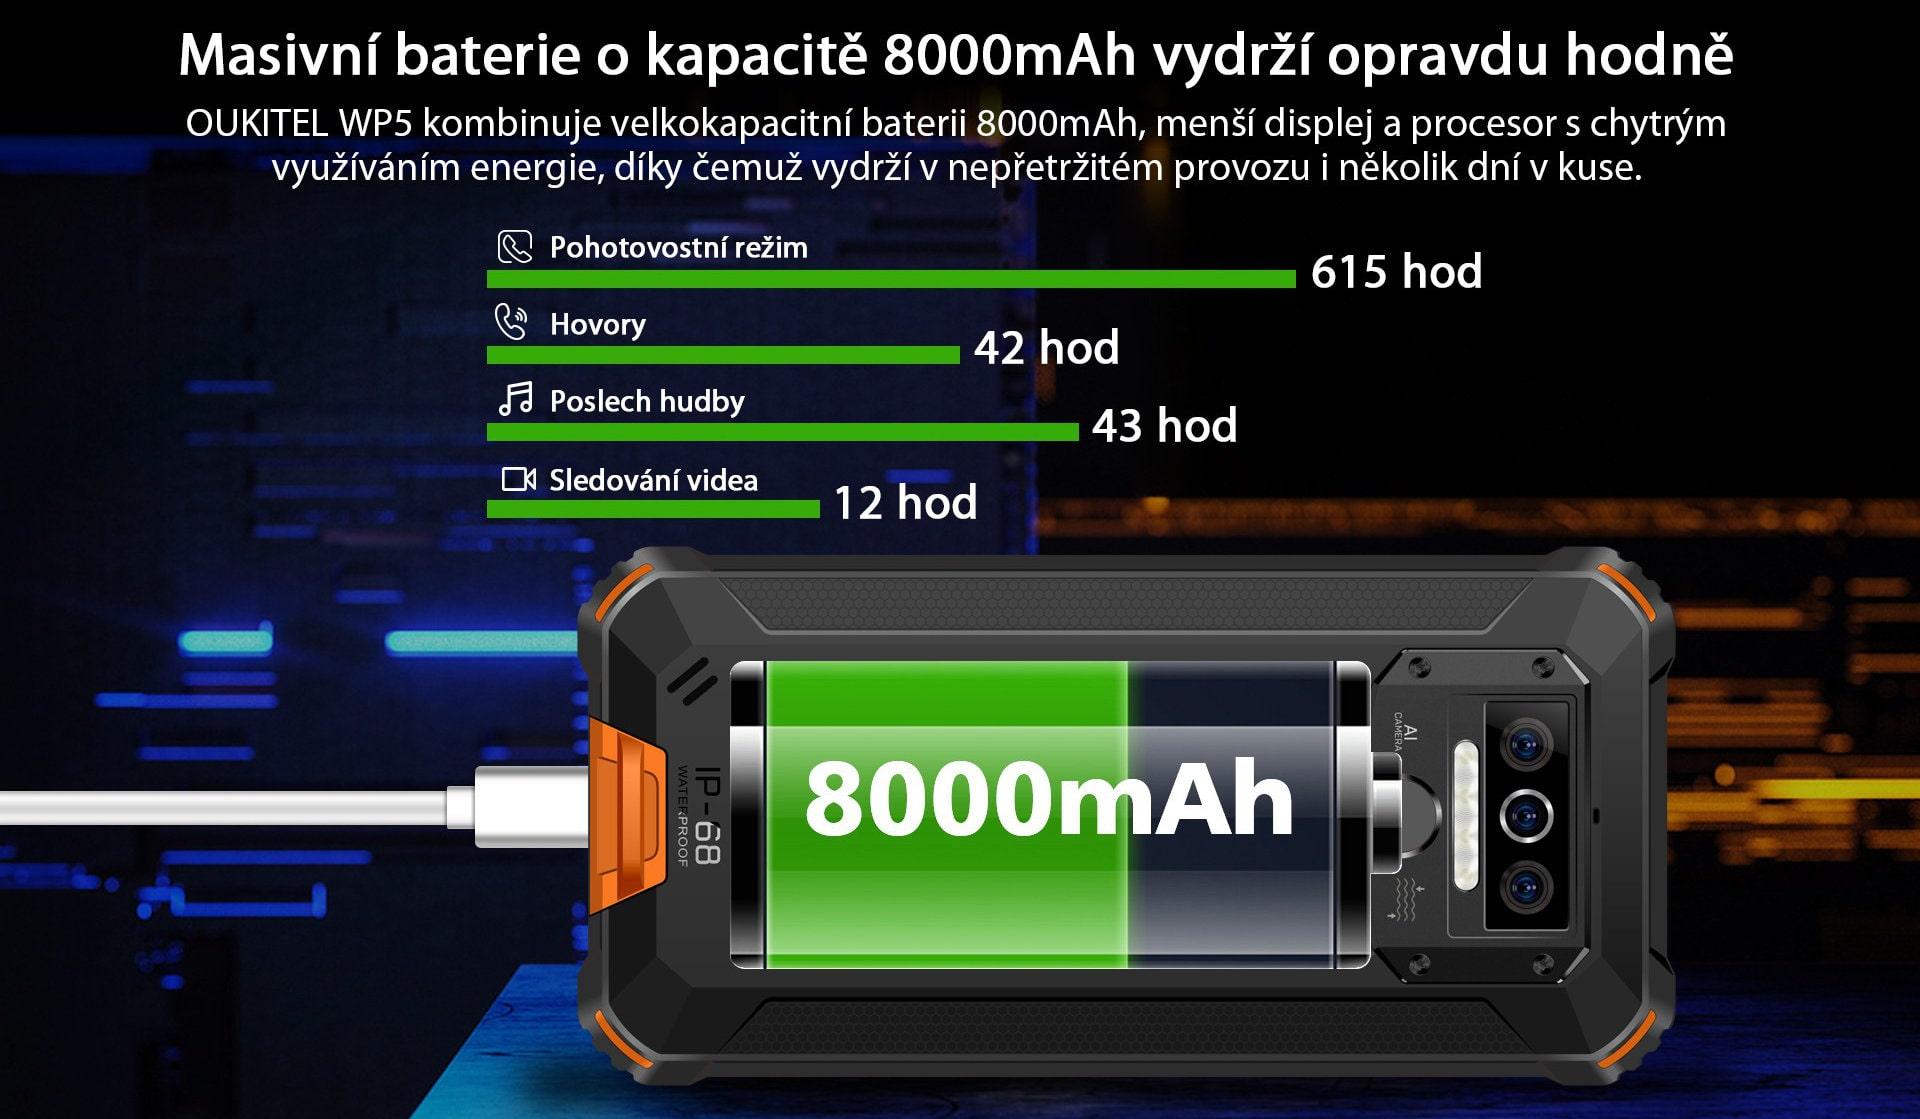 Oukitel-WP5-baterie